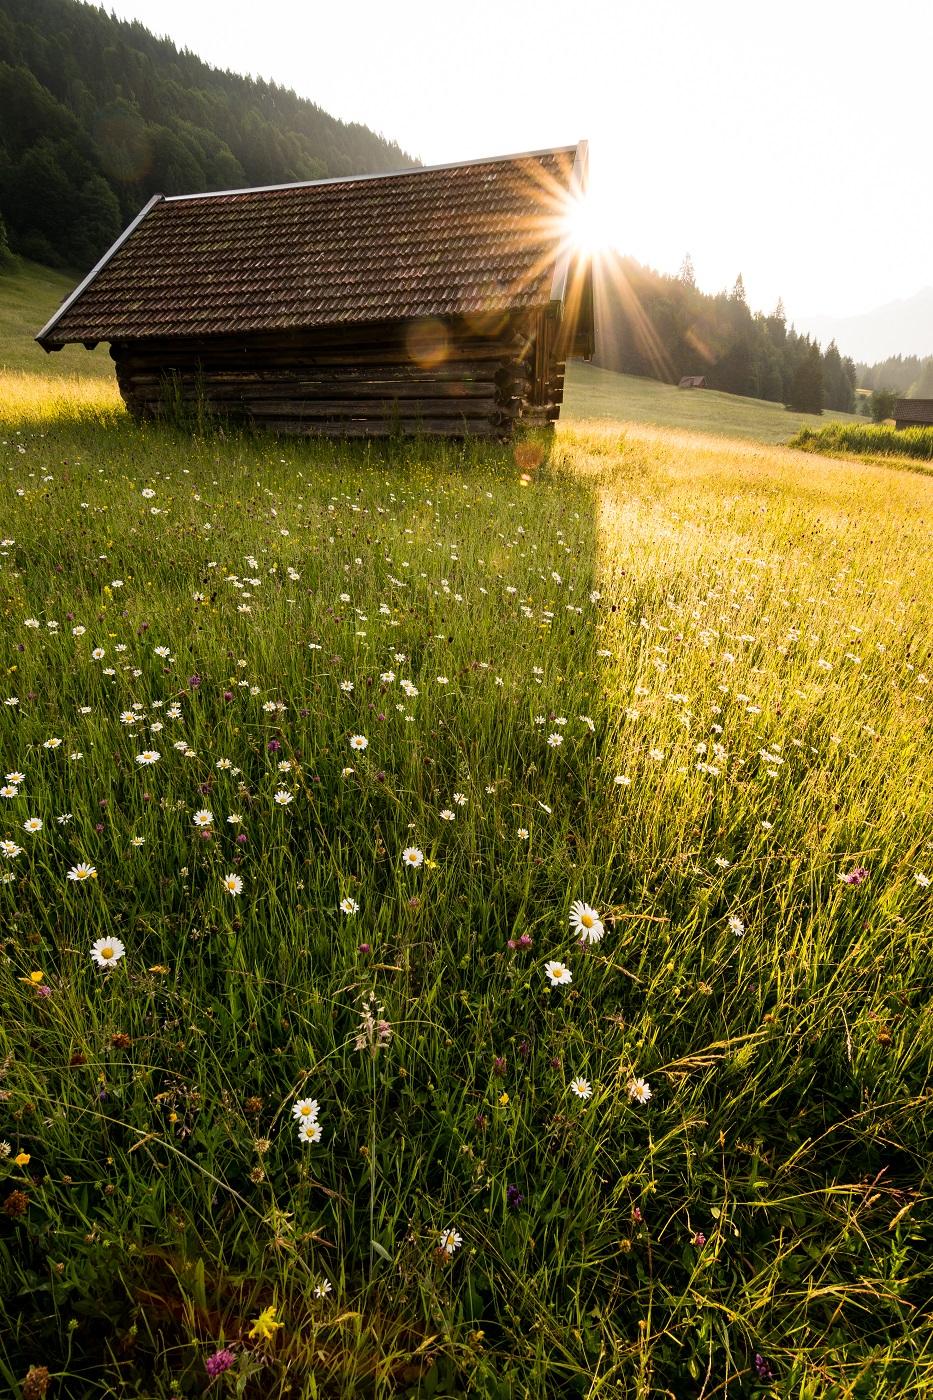 Wooden Hut at lake Geroldsee, Bavaria in Germany, Germany